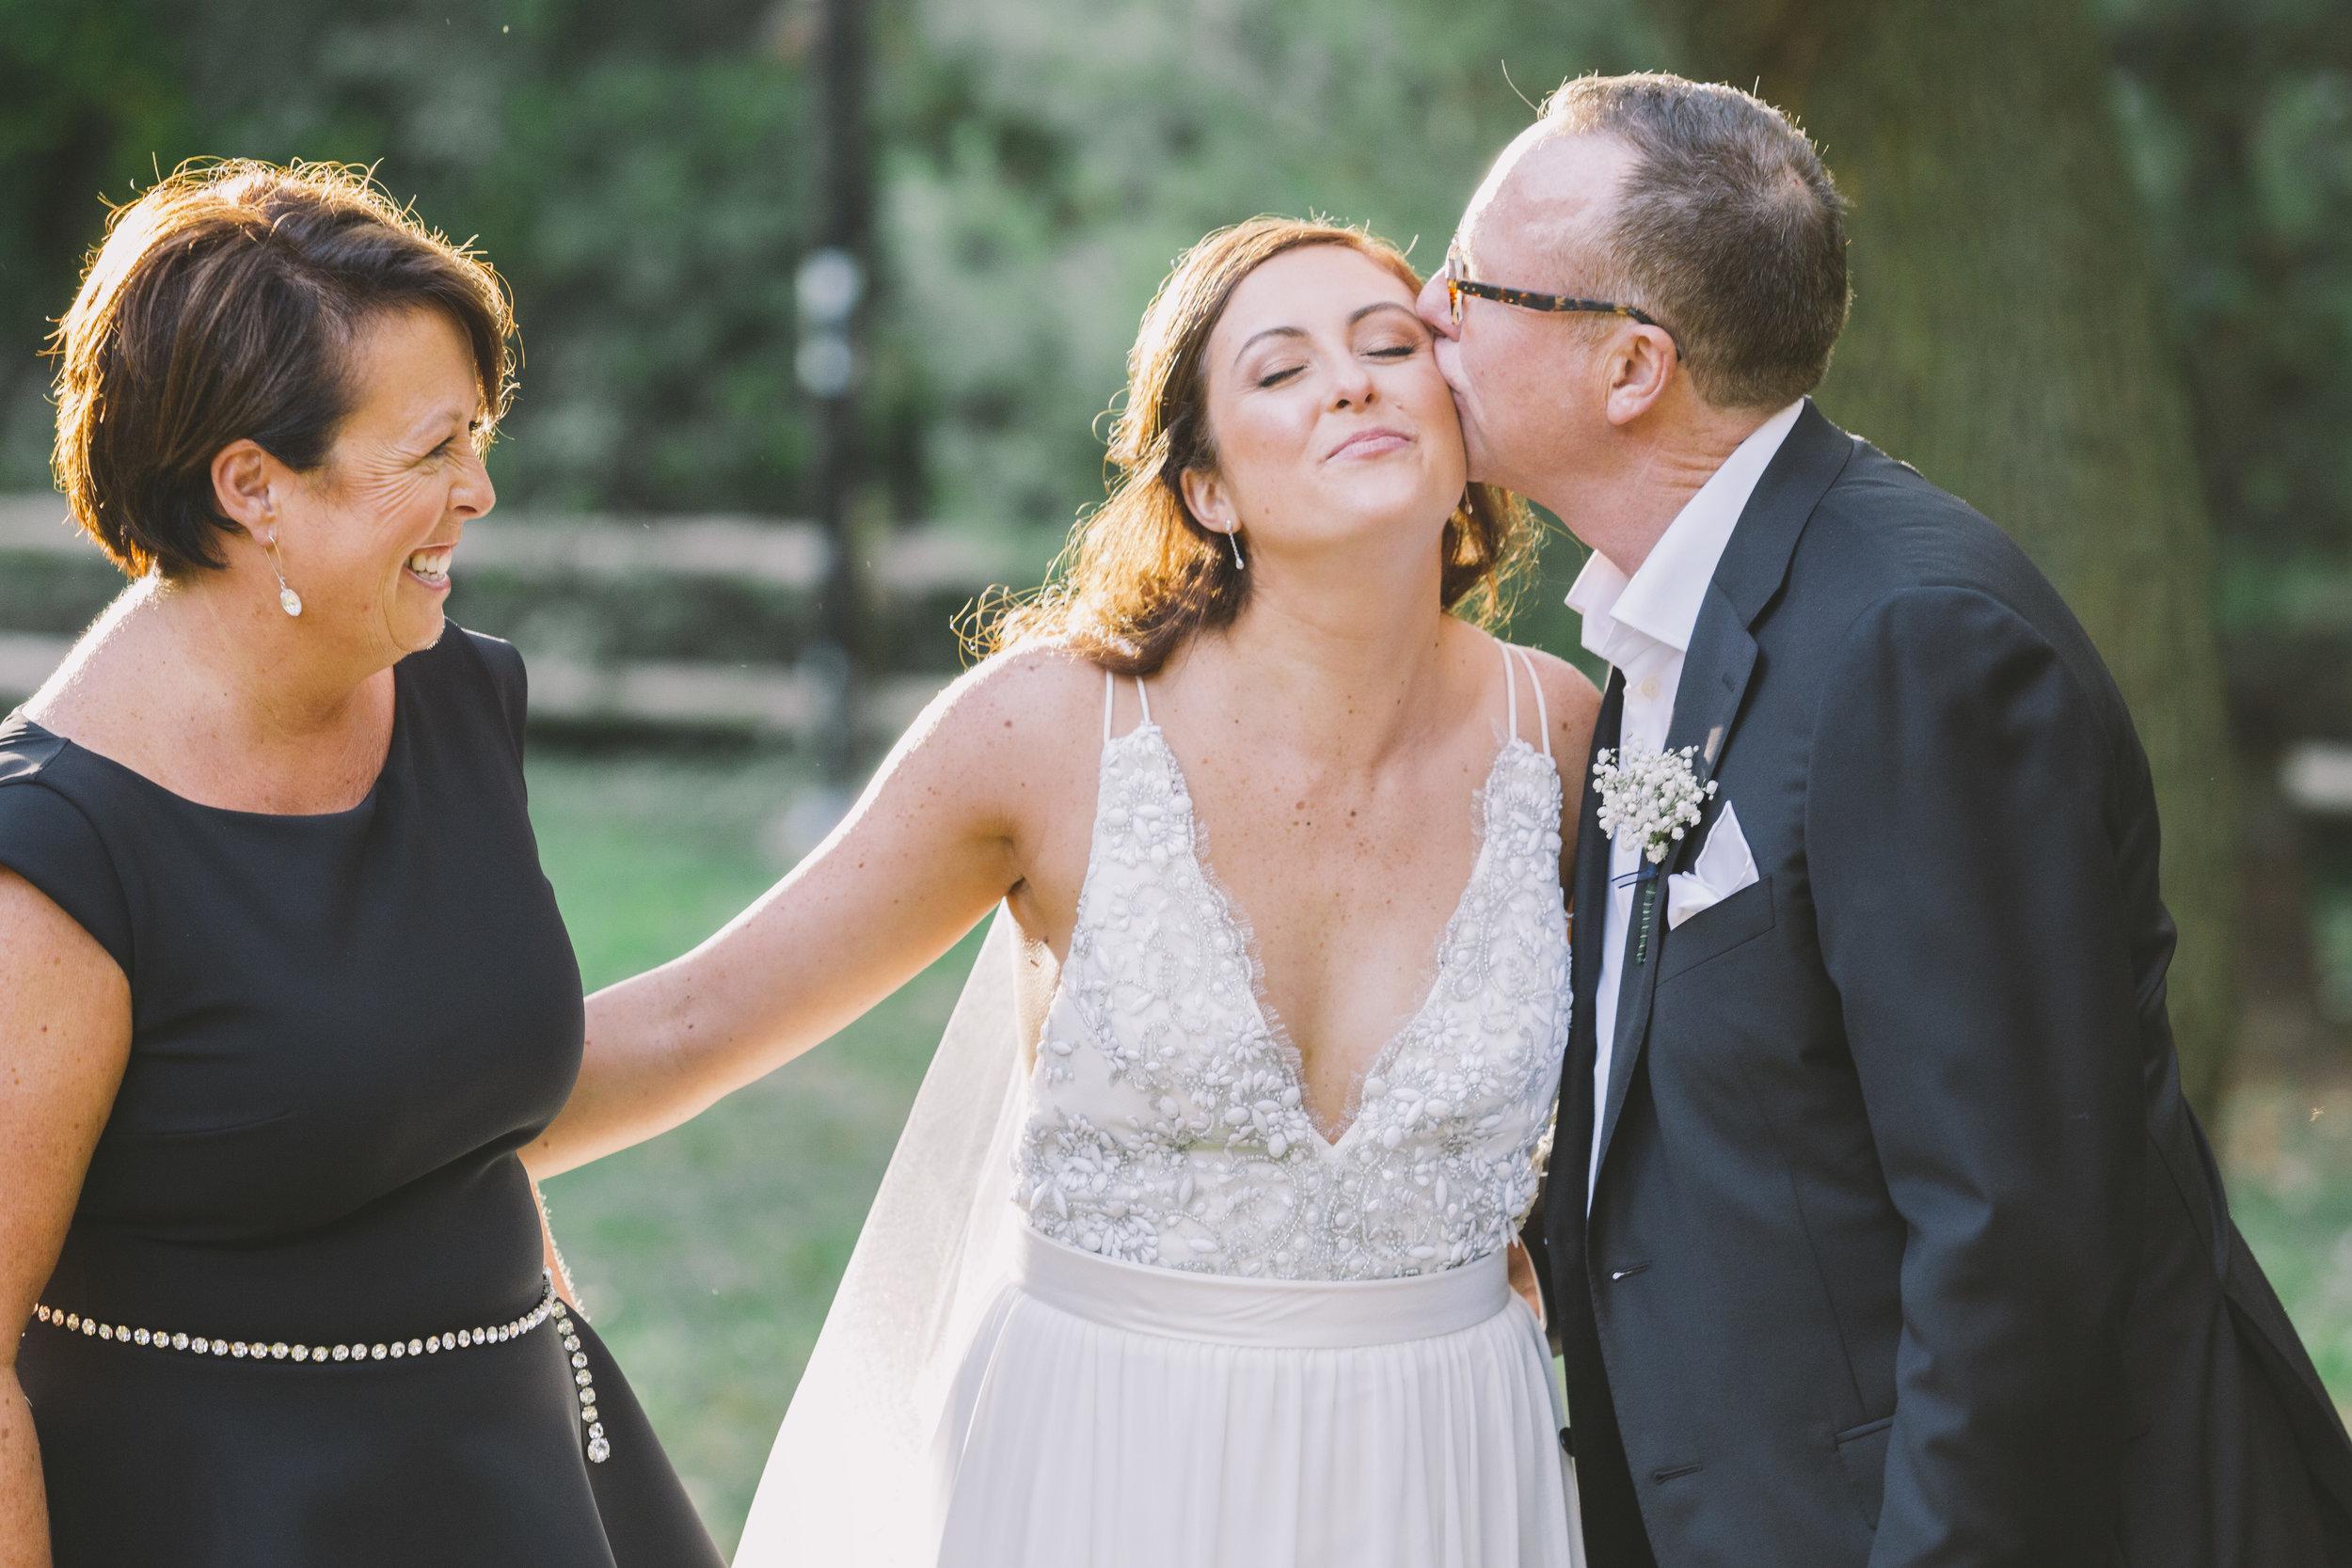 Bride and parents wedding photo.